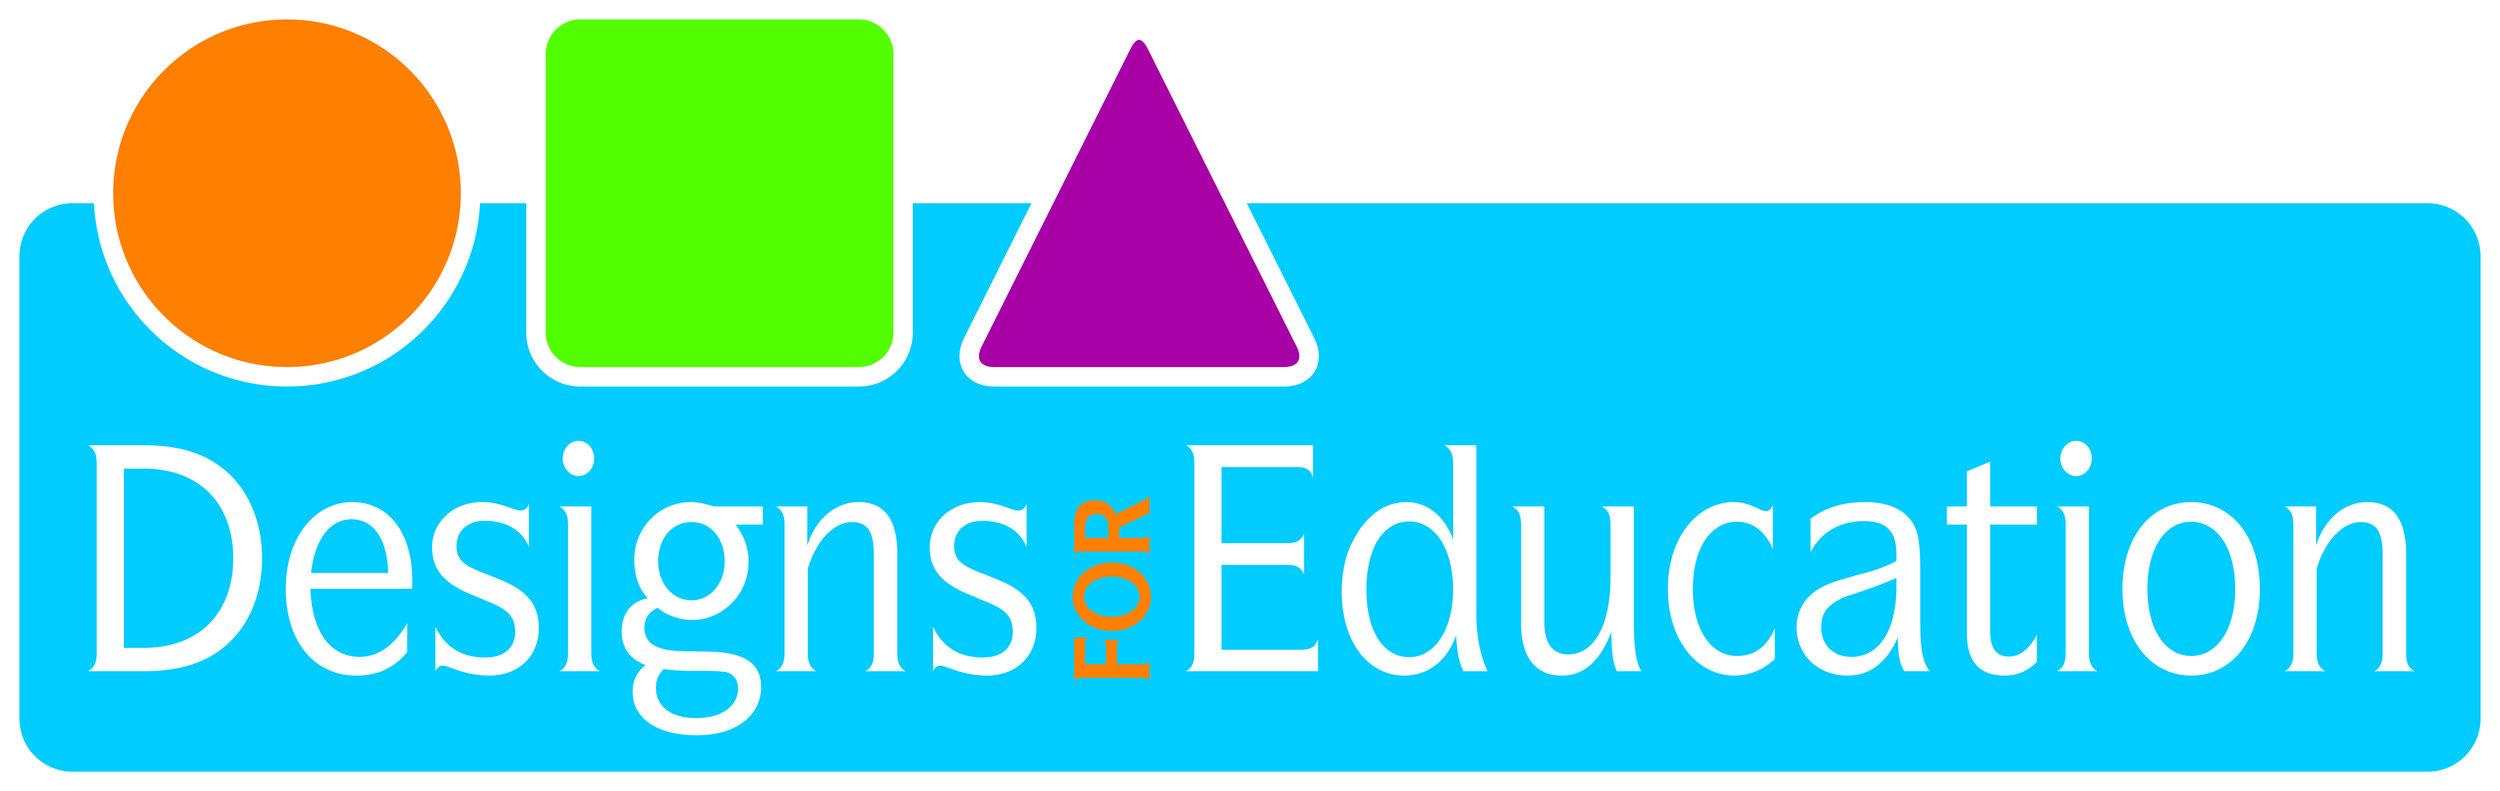 www.designsforeducation.co.uk